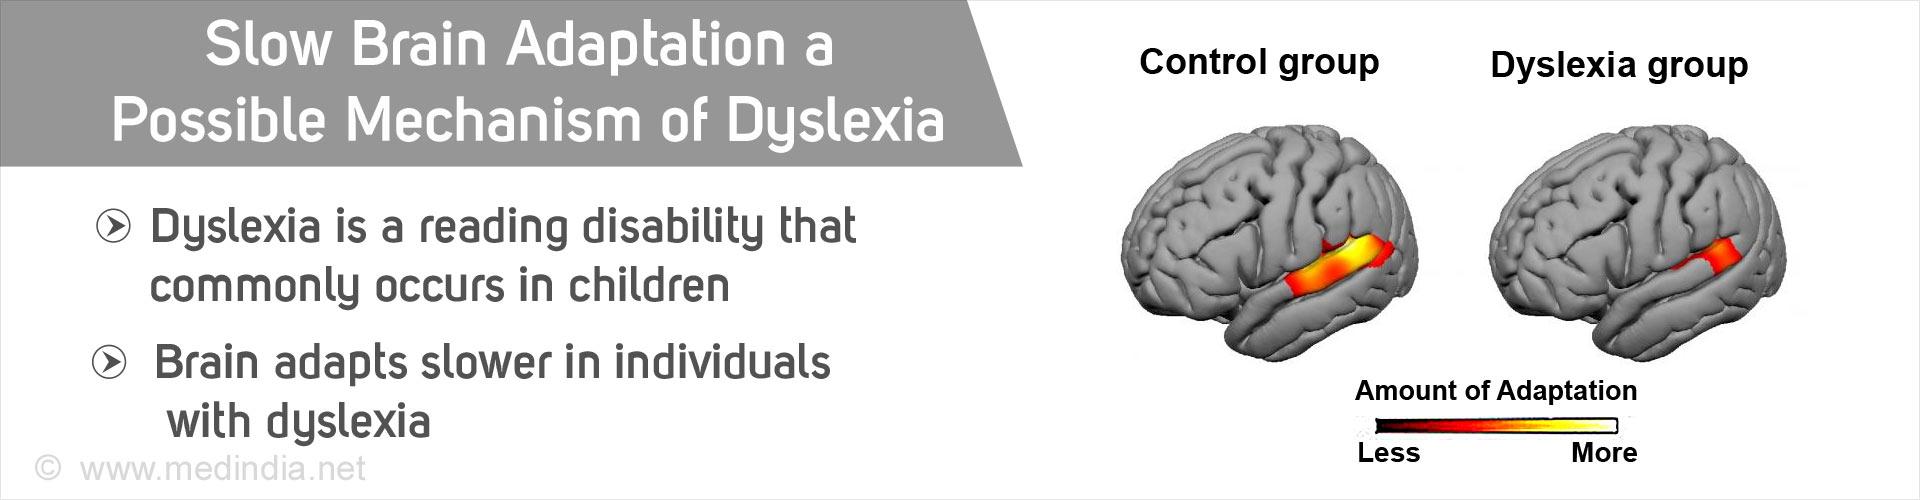 Brain Adaptation Slower in Dyslexia